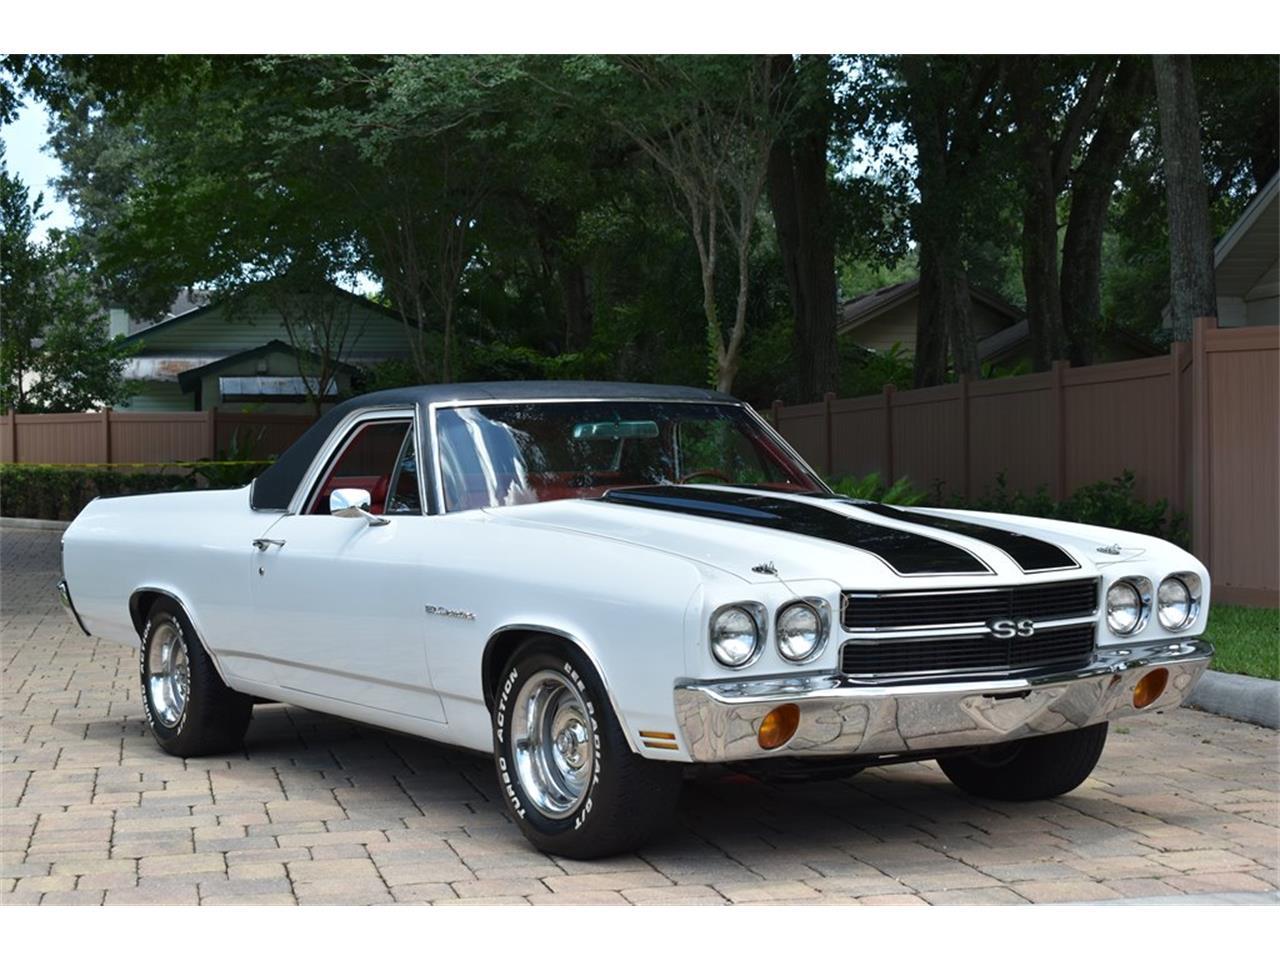 1970 Chevrolet El Camino (CC-1323167) for sale in Lakeland, Florida